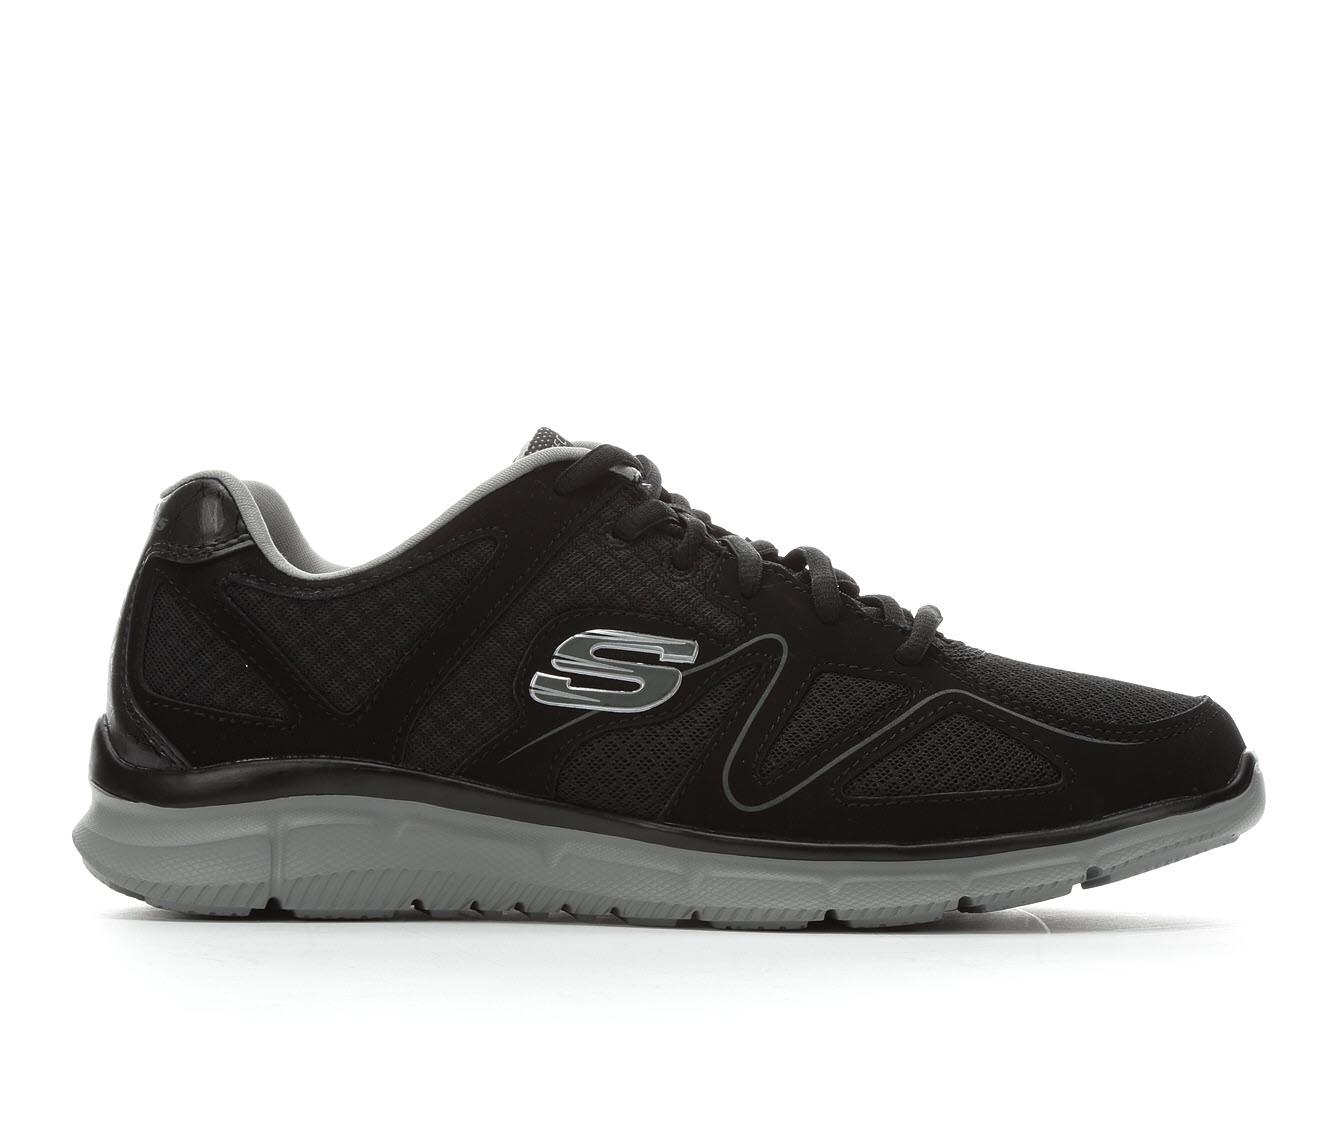 Men's Skechers Flash Point 58350 Running Shoes (Black - Size 11.5) 1687119